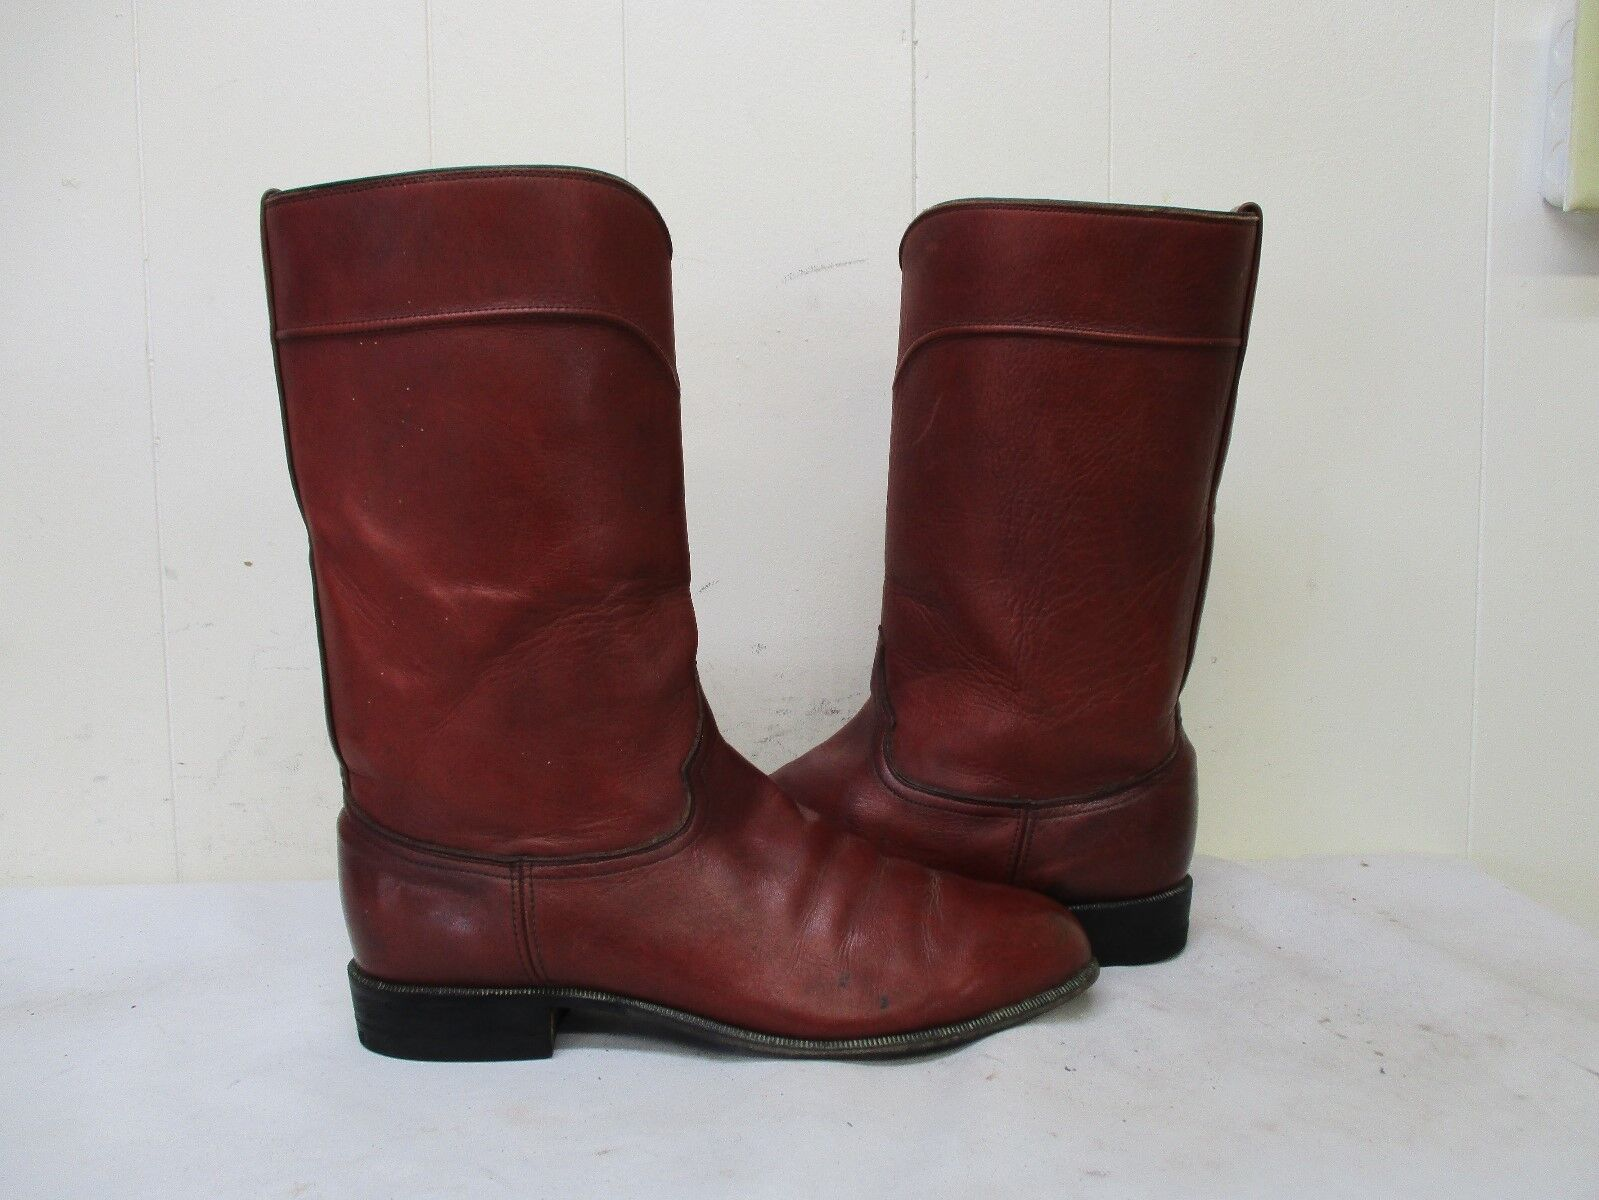 JS Justin London Tan Leather Cowboy Boots Mens Size 9.5 D Style 50005